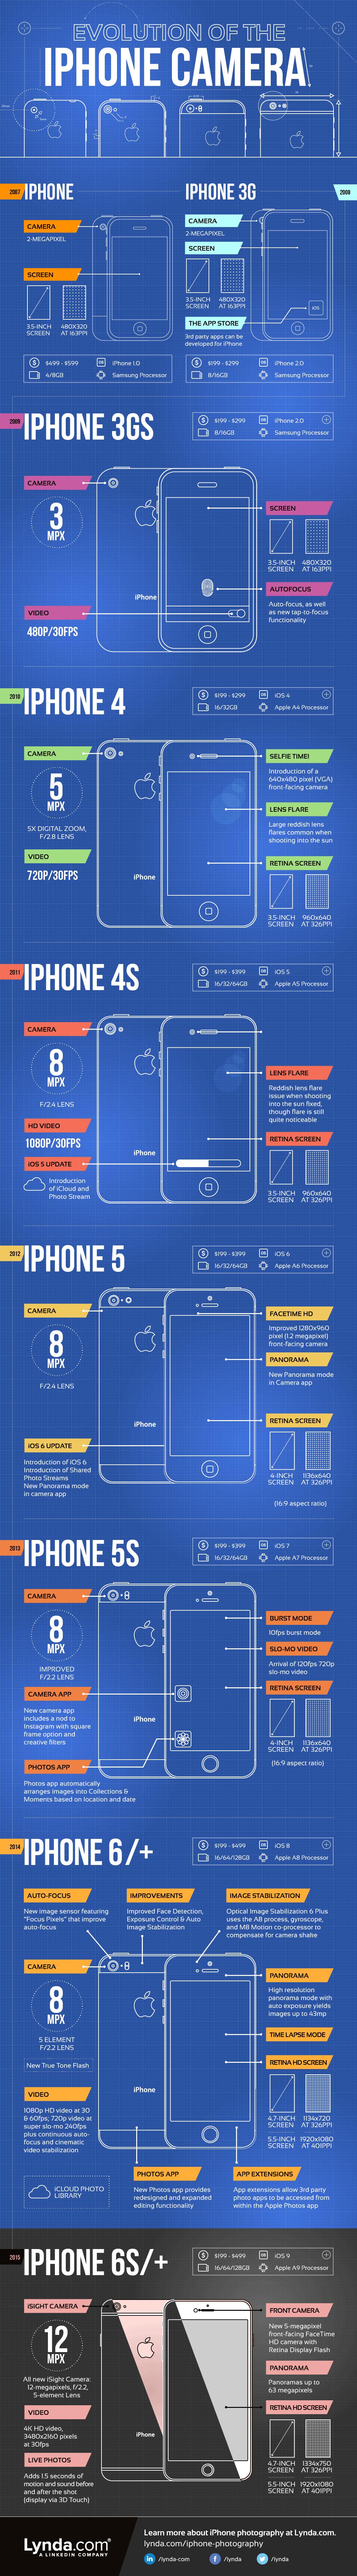 Evolution-iPhone-Camera-2